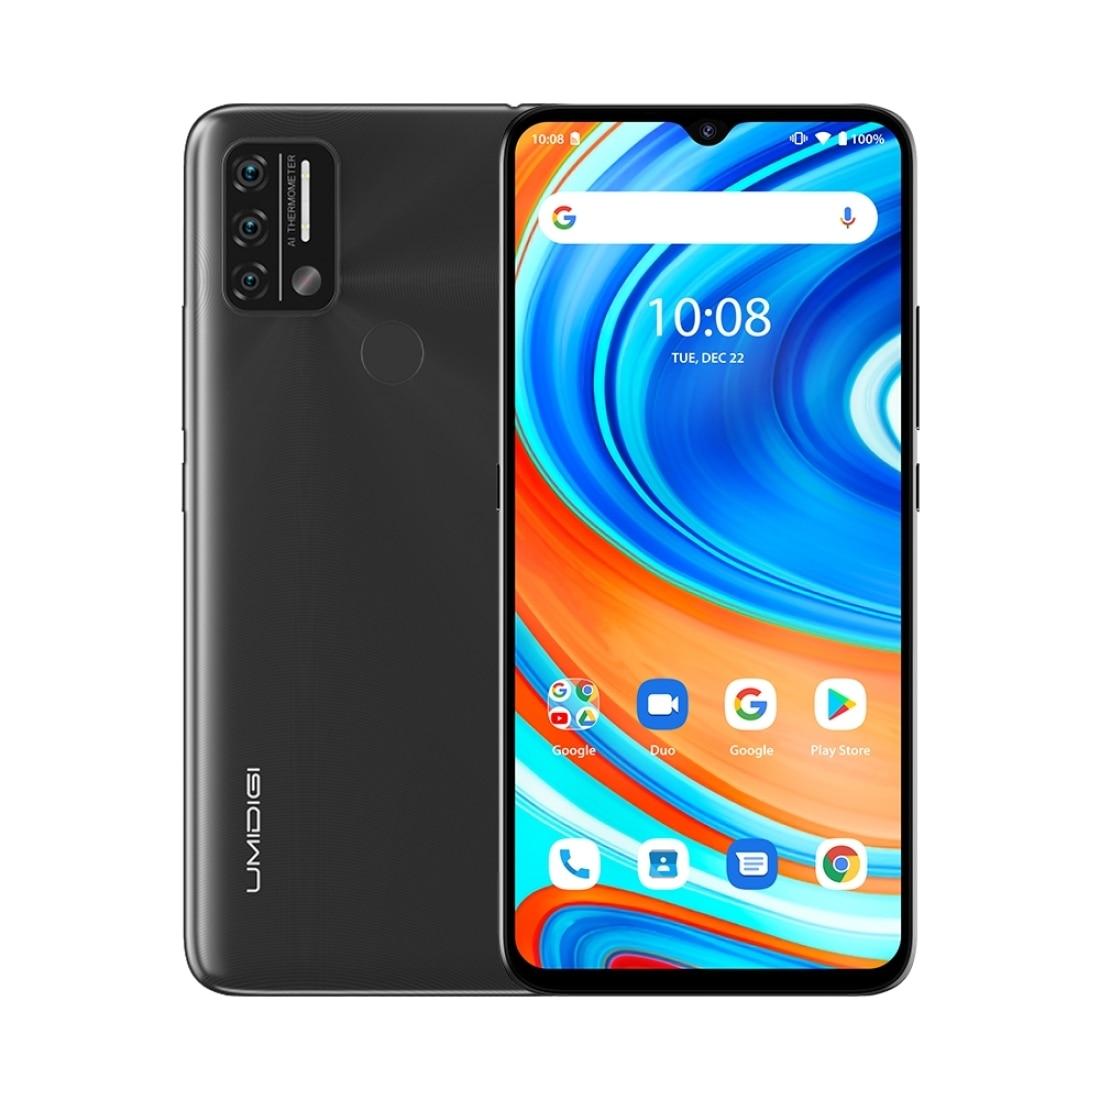 UMIDIGI A9 Android 11 Global Version Smartphone 13MP AI Triple Camera 3GB 64GB Helio G25 Octa Core 6.53